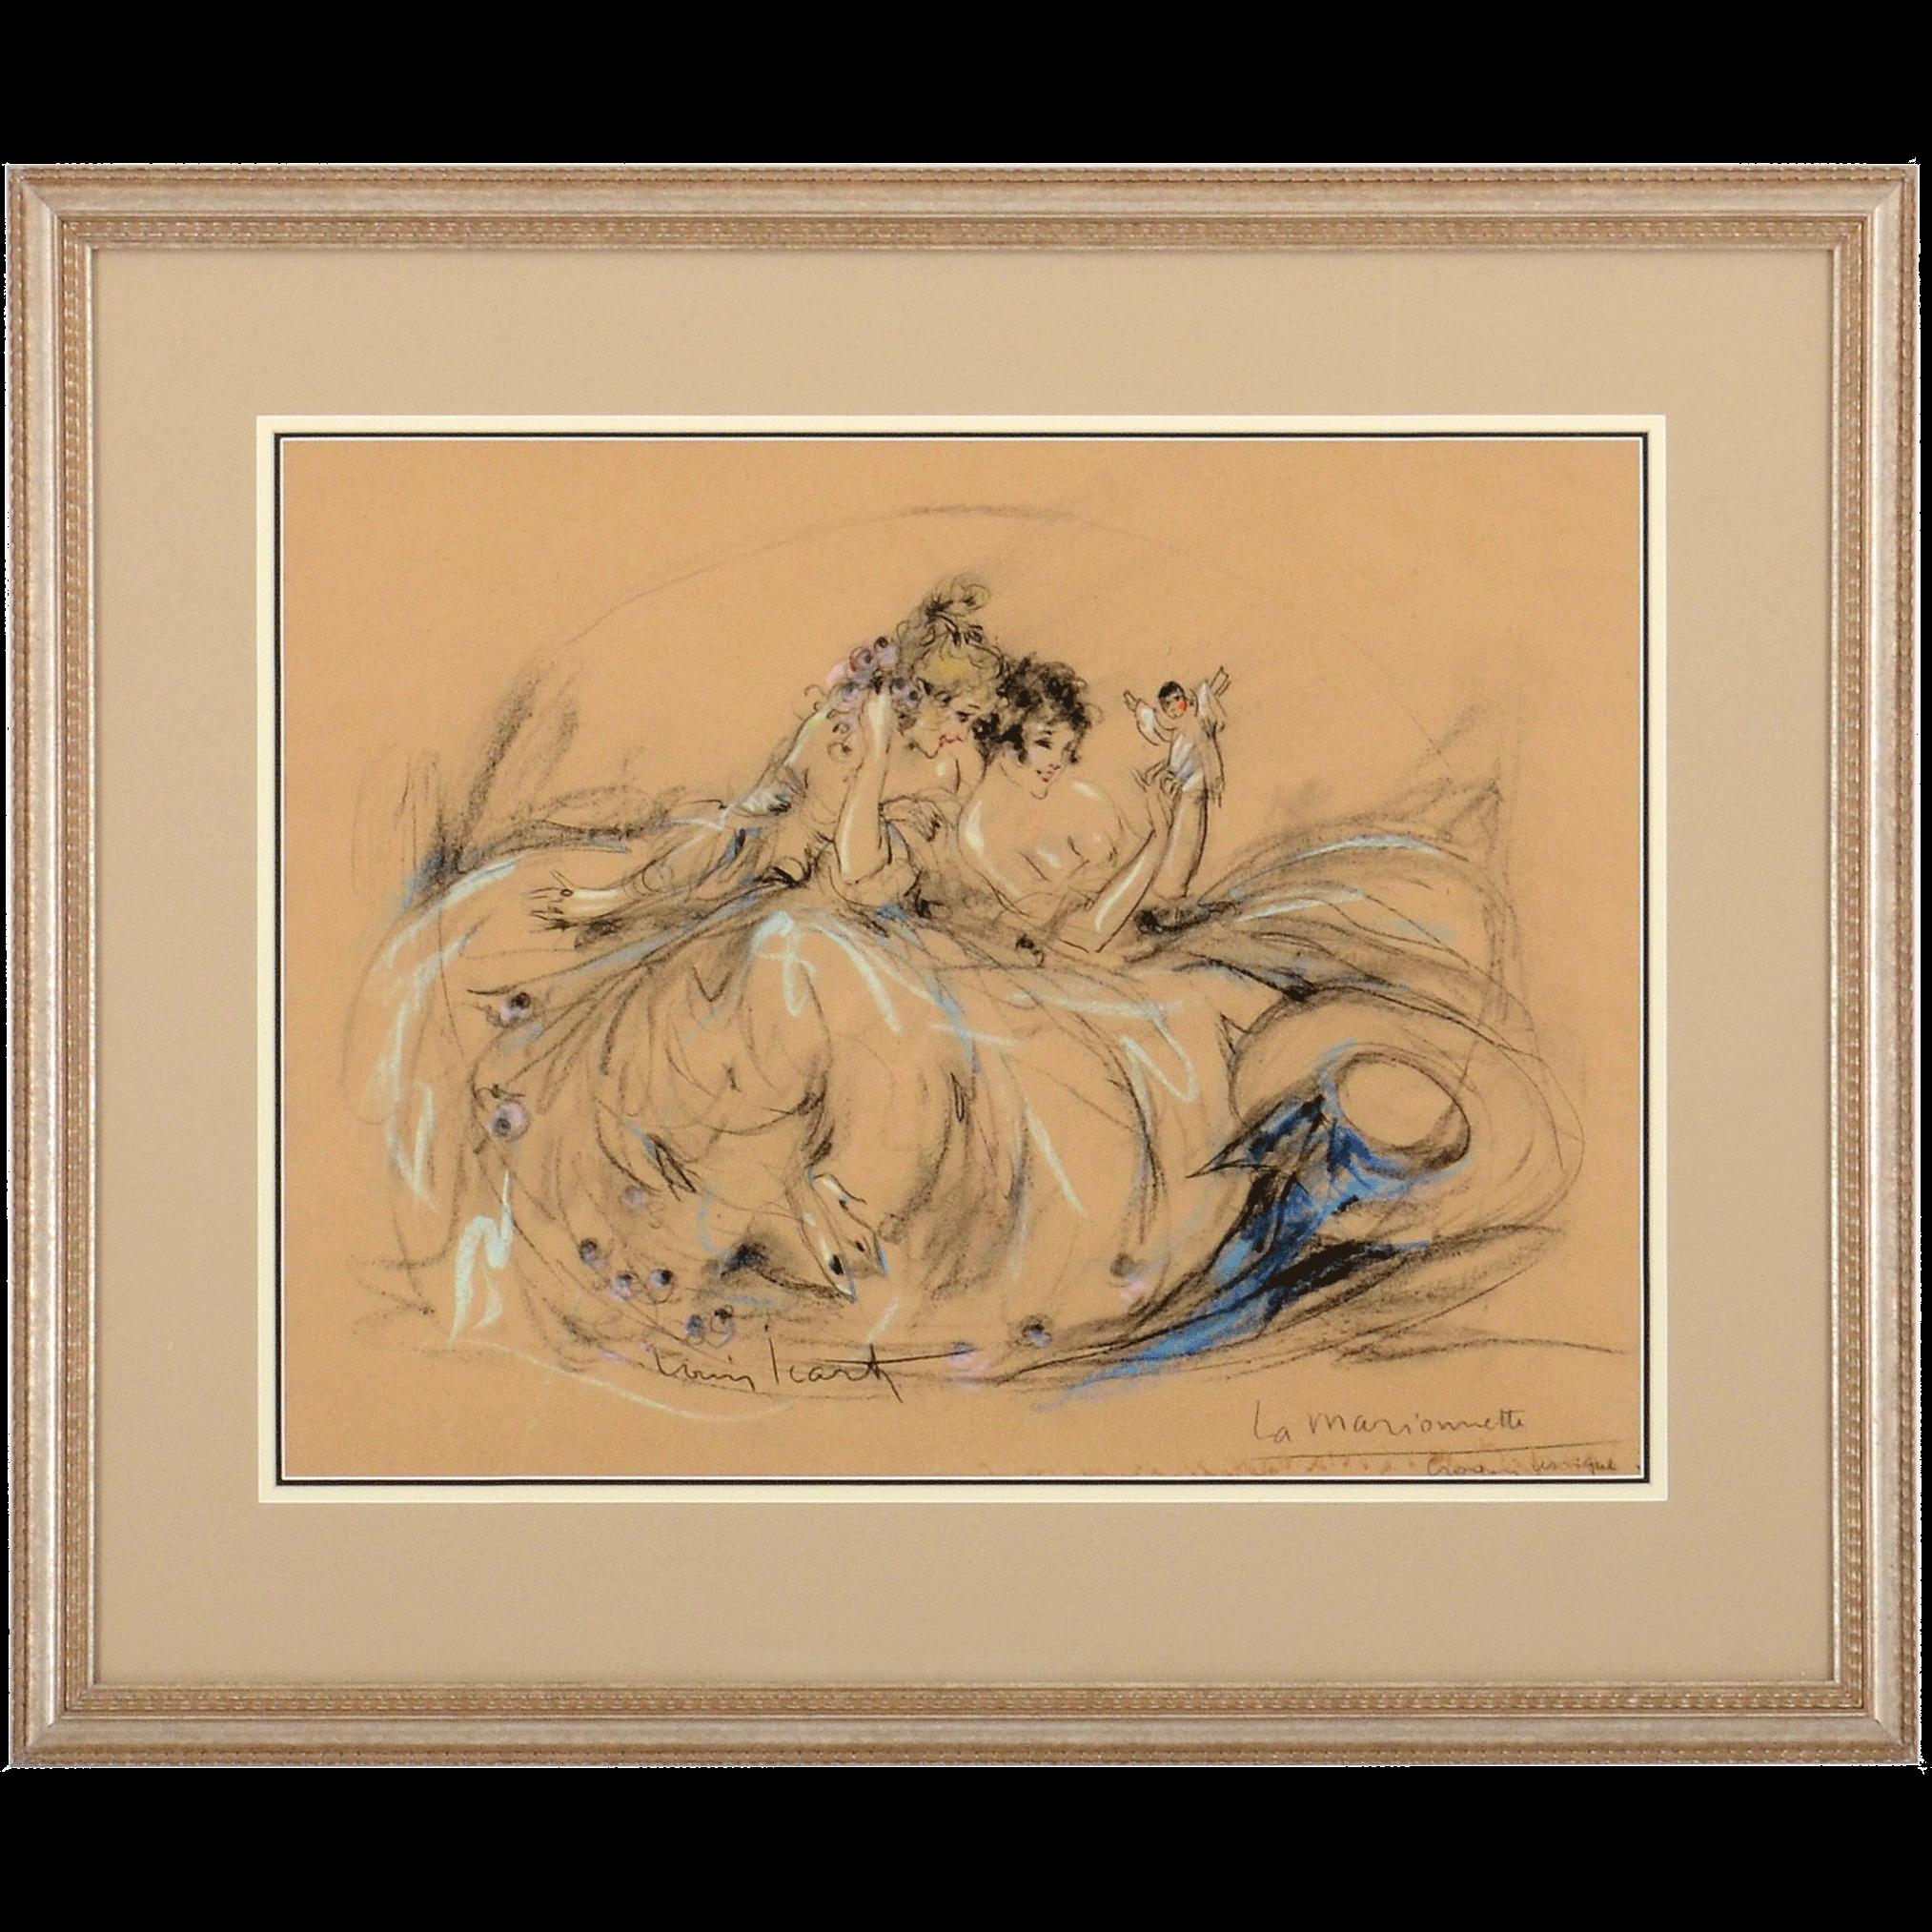 Original Louis Icart Signed Pastel Sketch Le Marionette